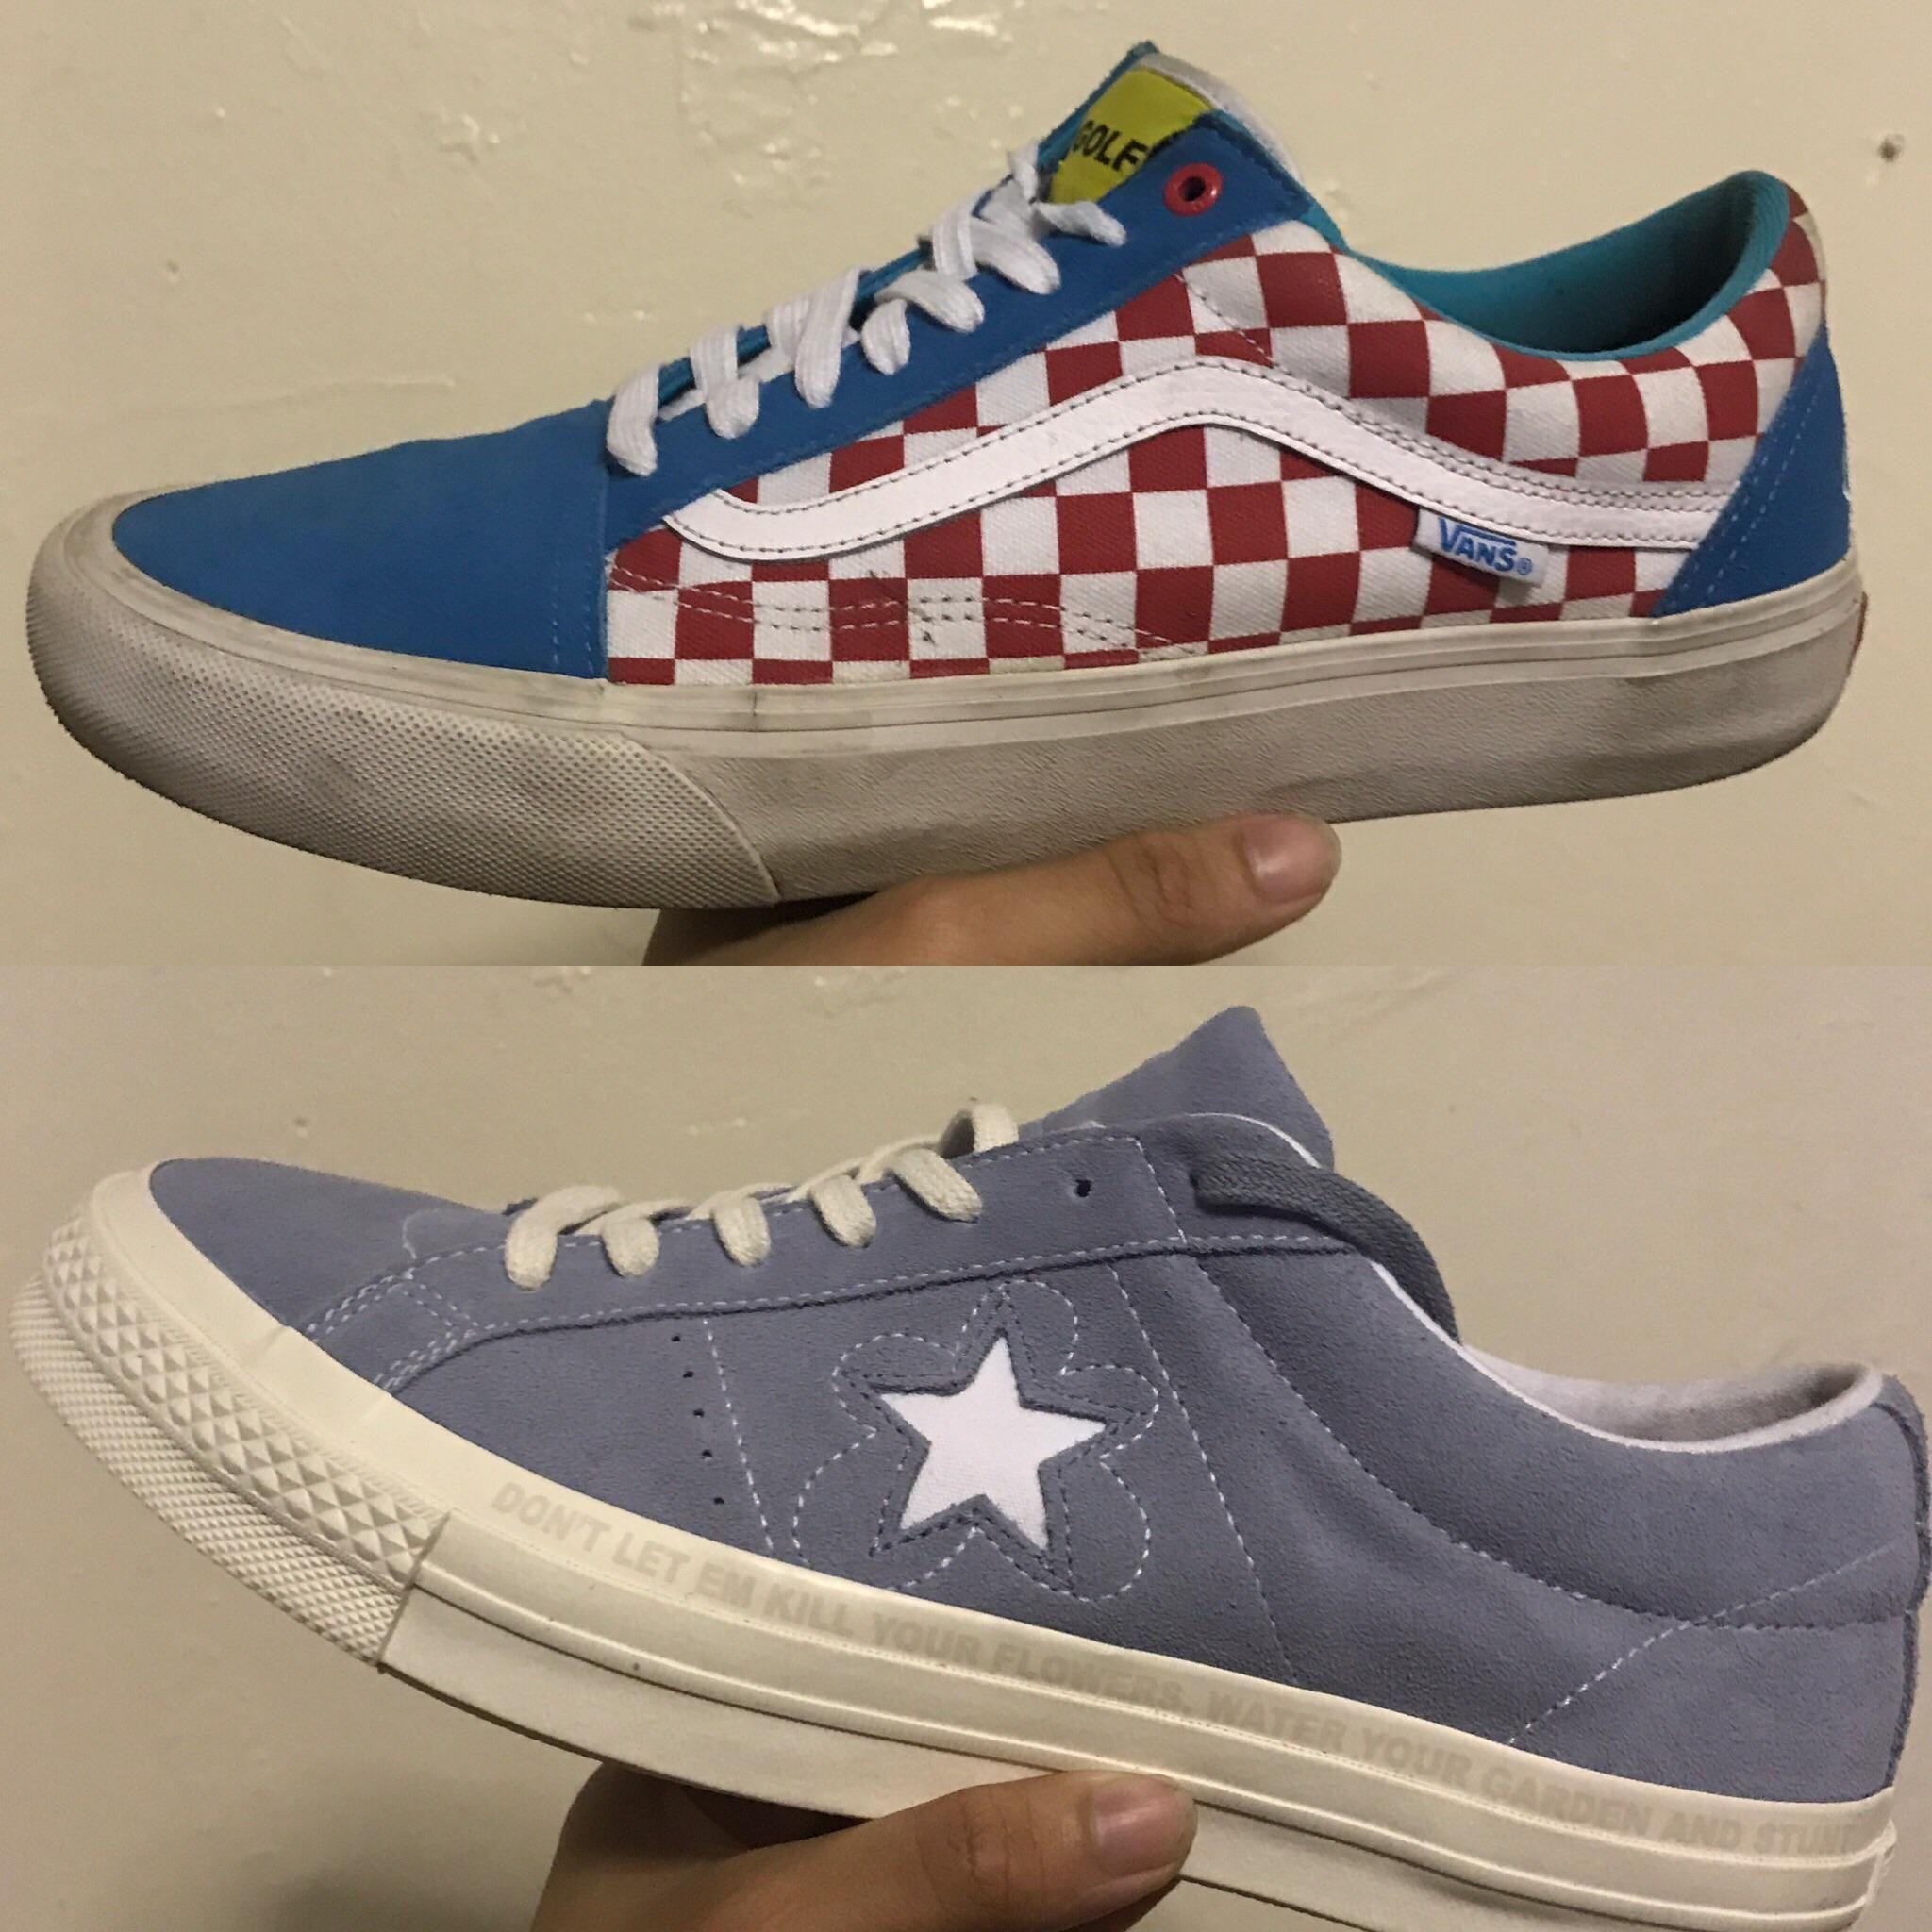 vans vs nike skate shoes